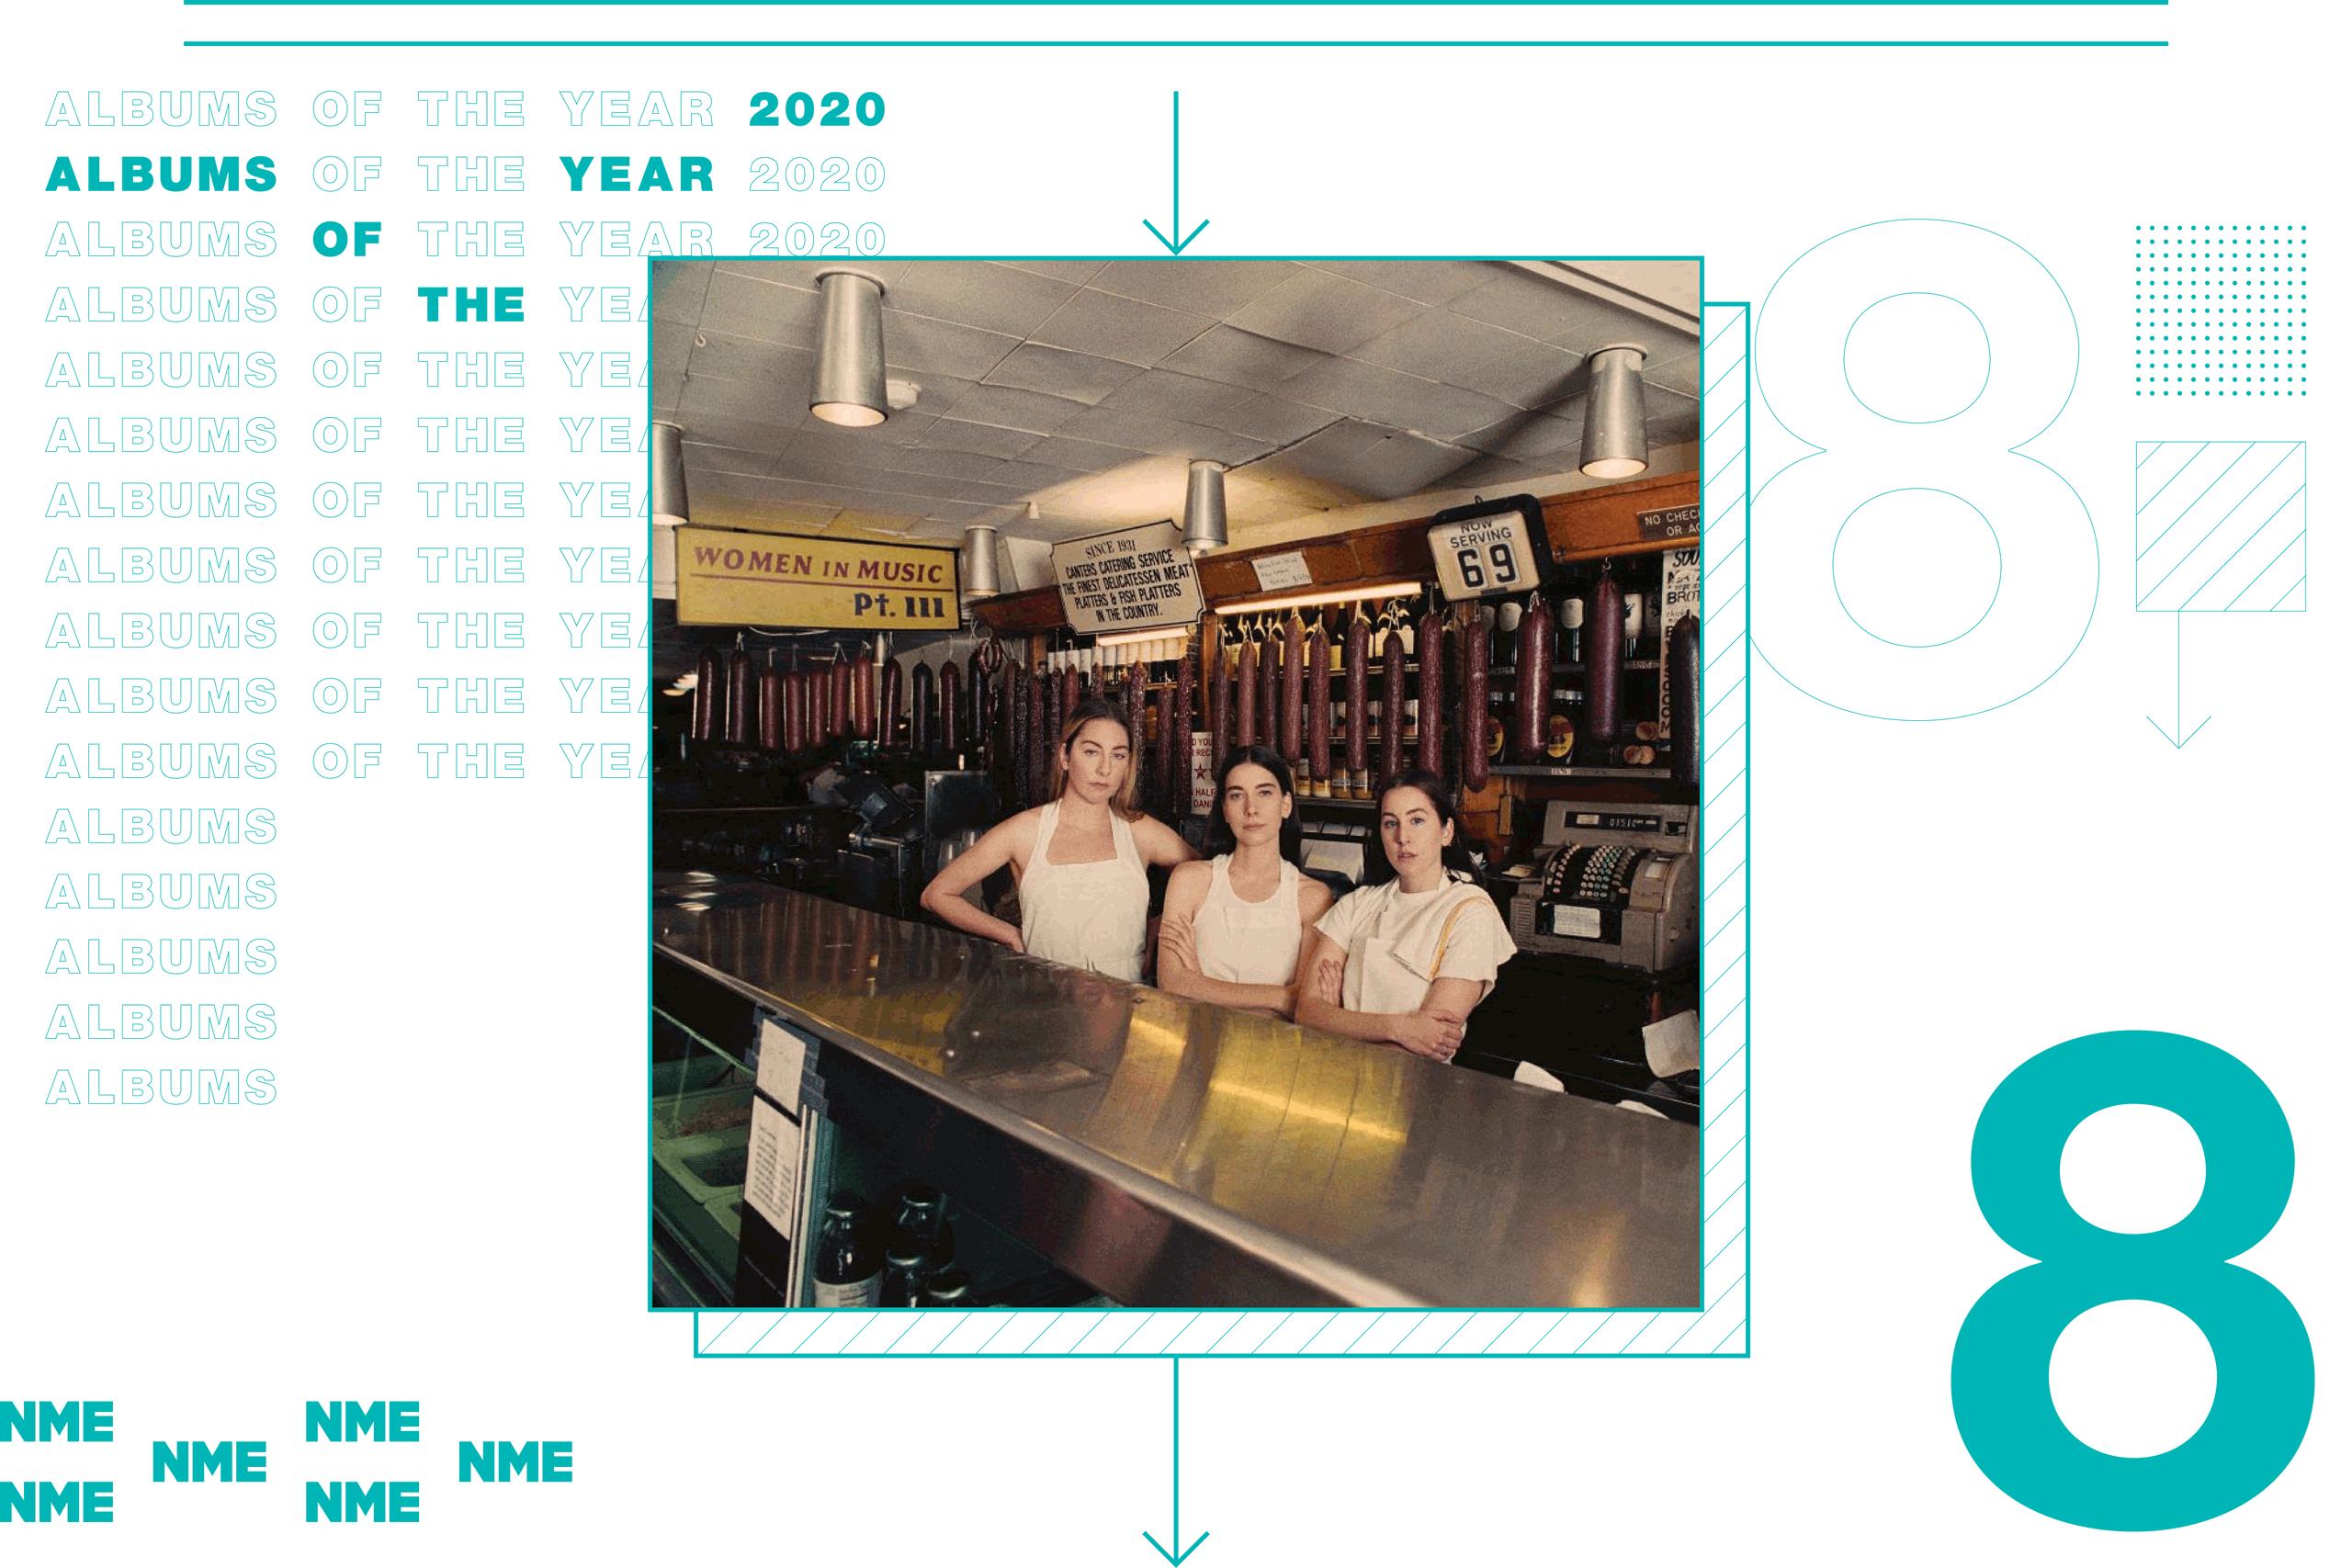 NME Album Of The Year 2020 Haim, 'Women in Music Pt III'